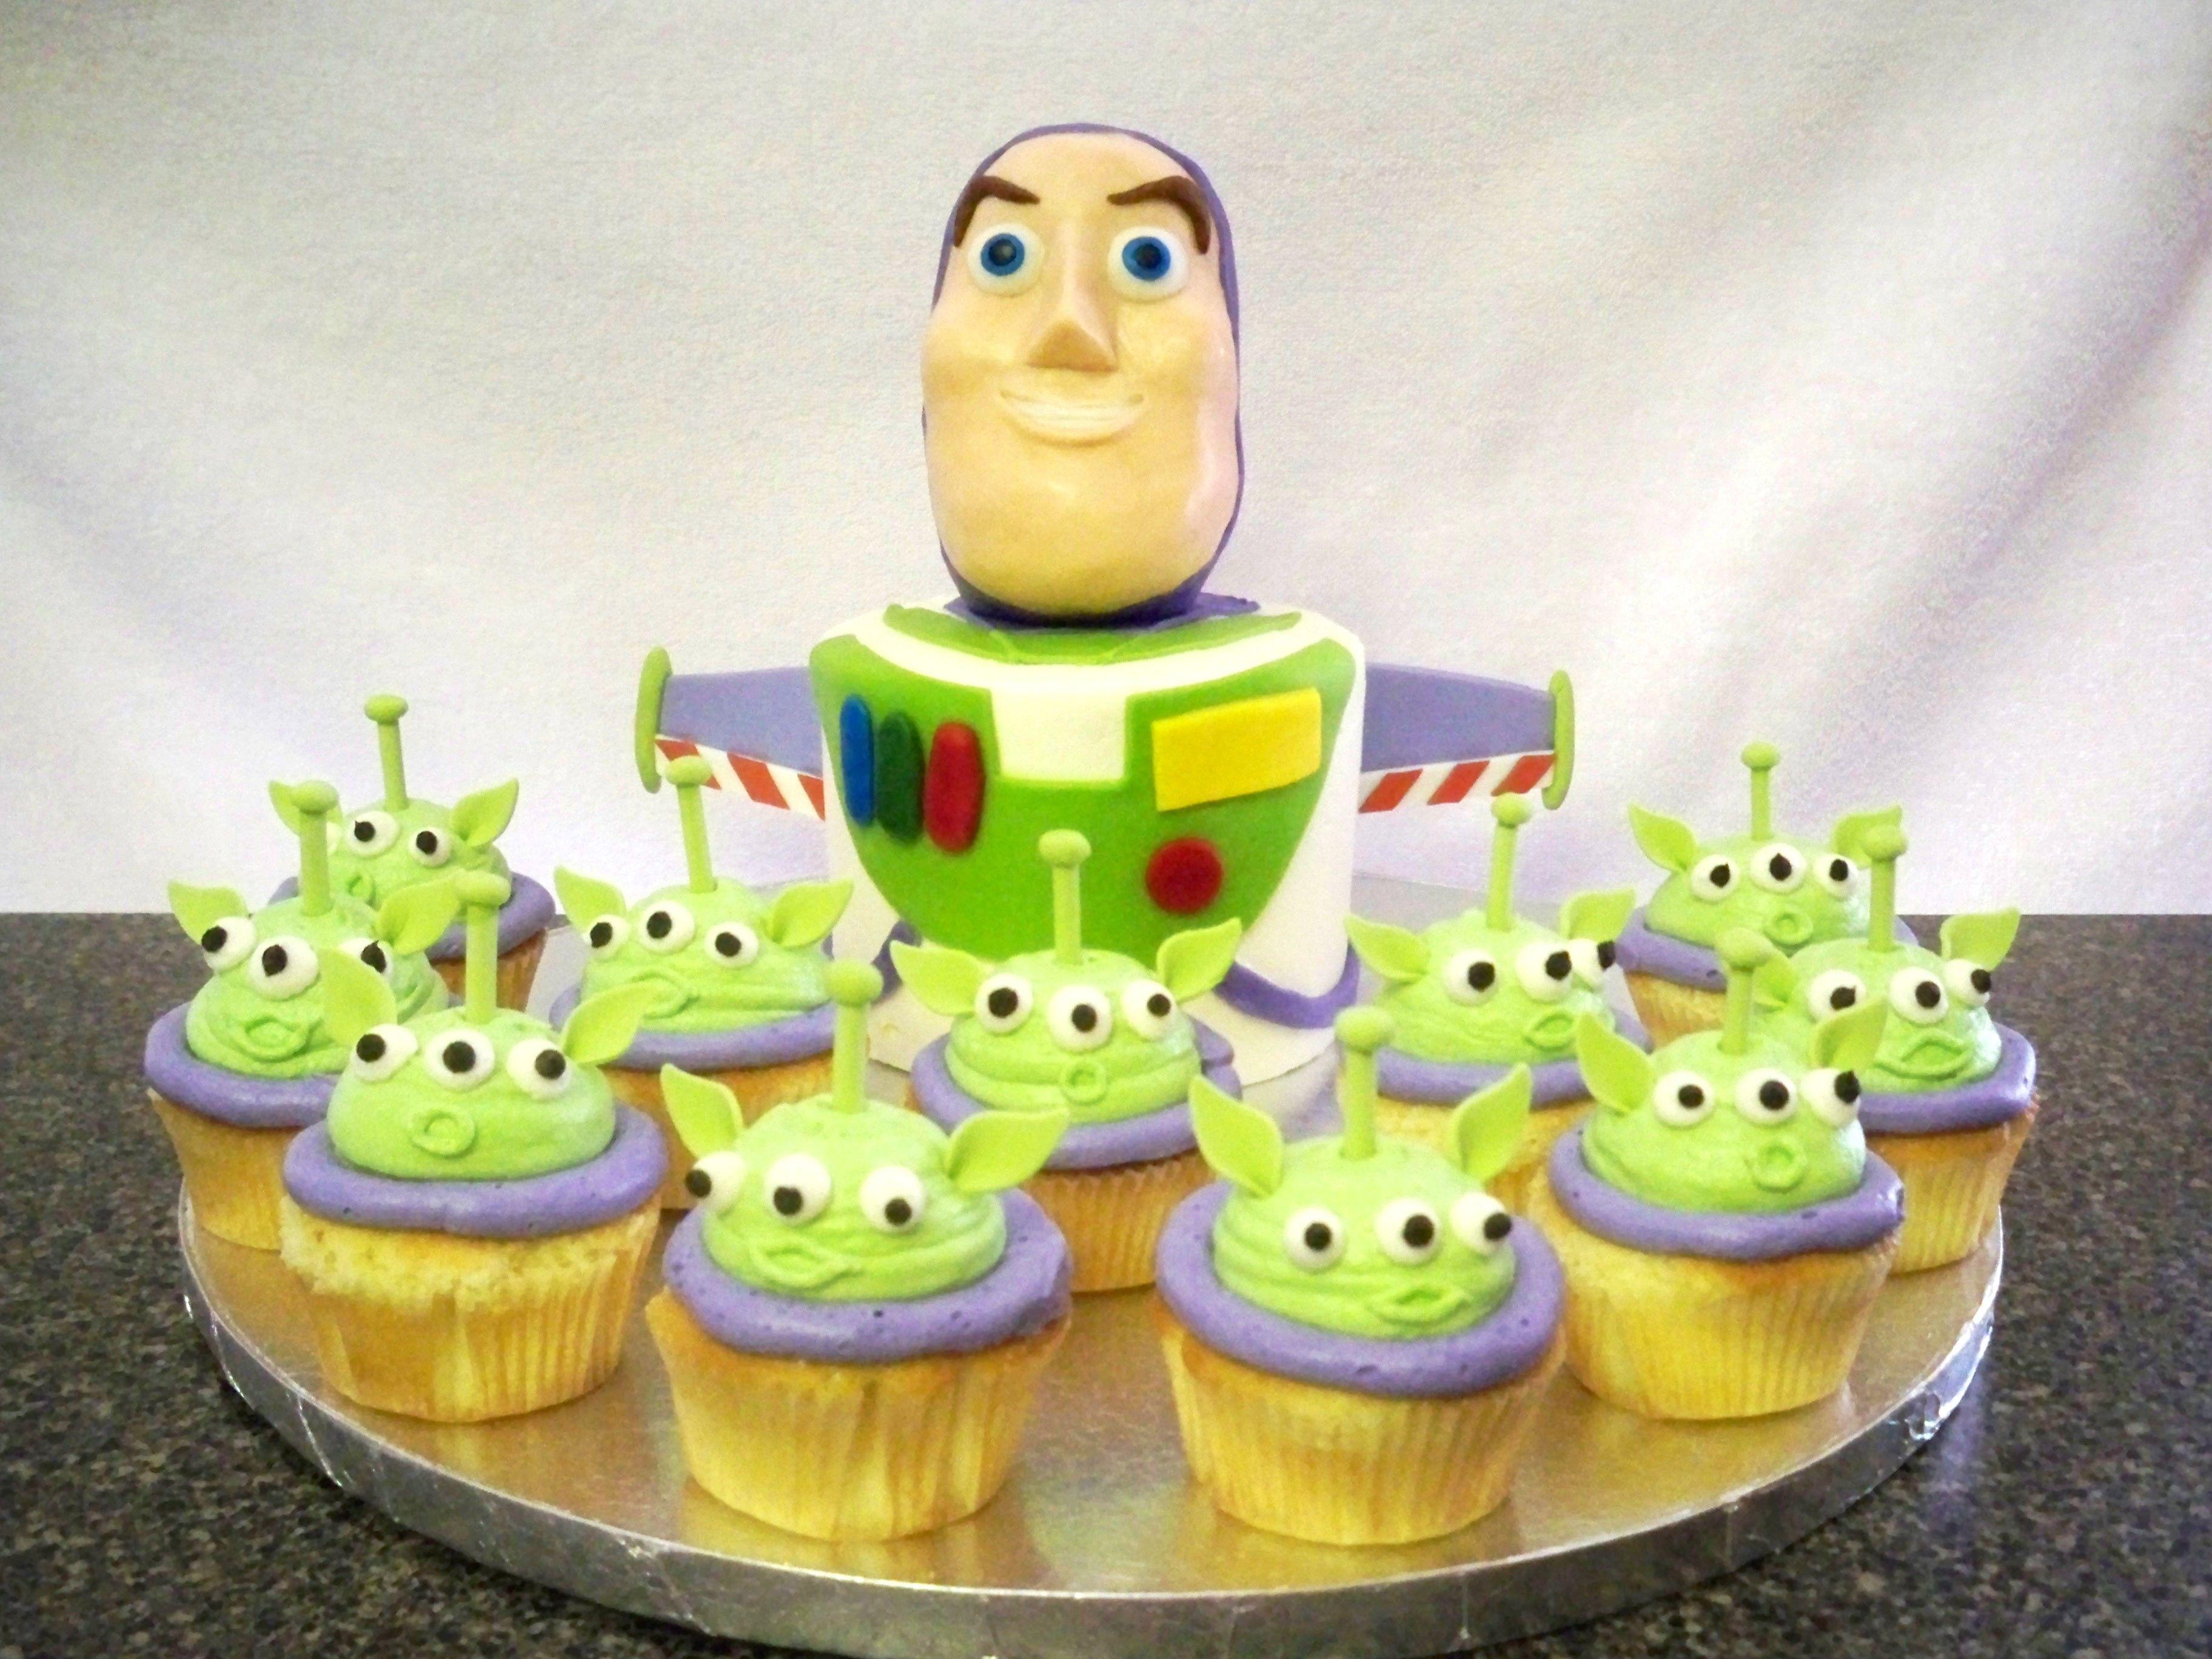 Buzz Lightyear Cake And Alien Cupcakes Contemporarycakery